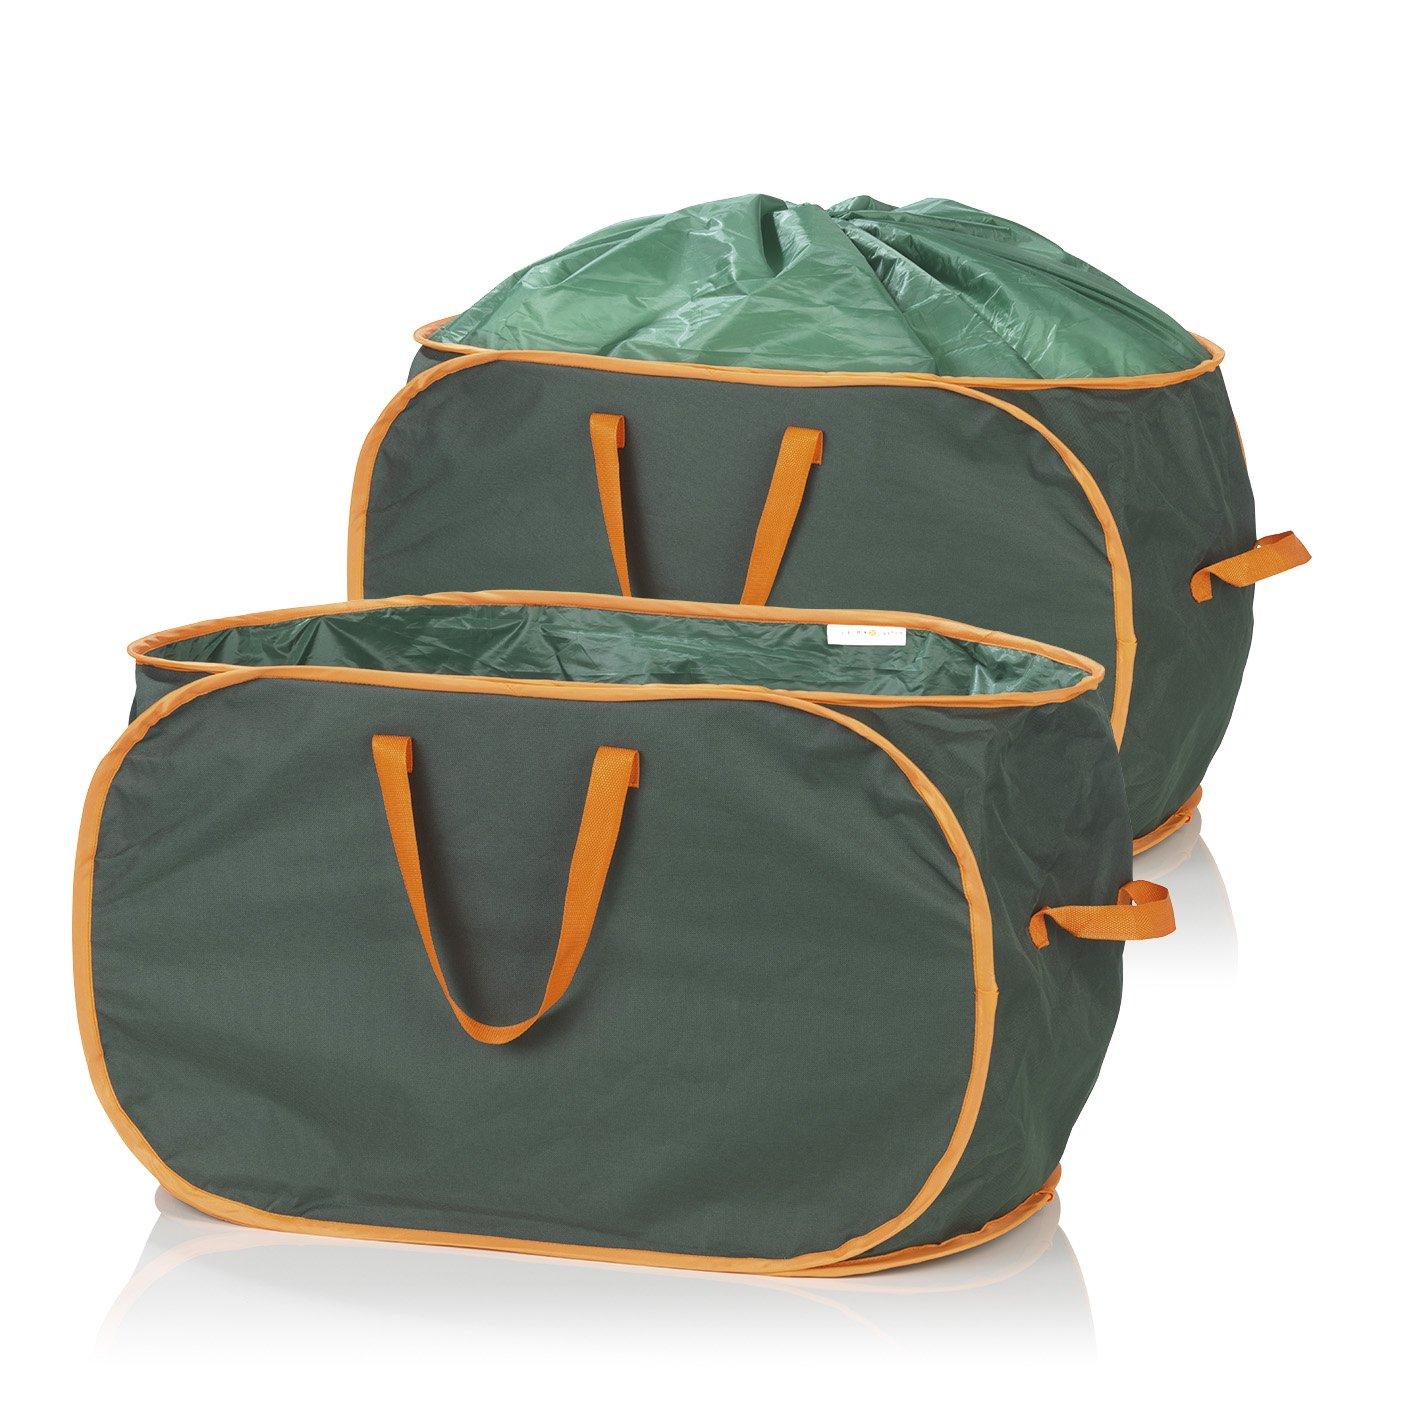 Prima Garden Gartenabfalltasche verschließbar - Laubtasche - Gartenabfallsack verschließbar